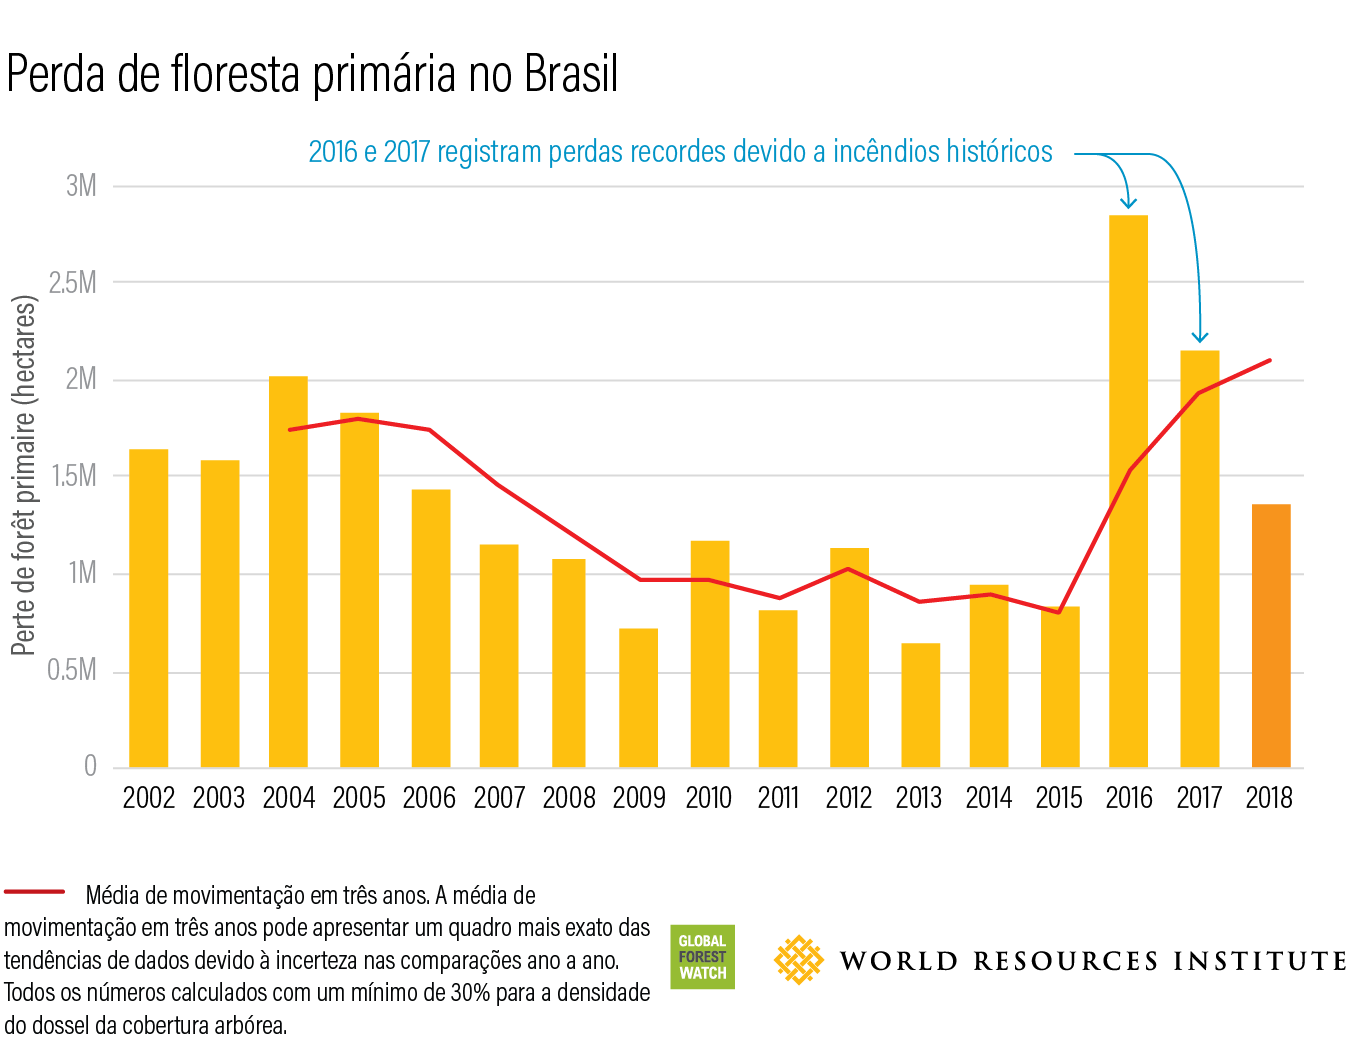 Perda de floresta primaria no Brasil